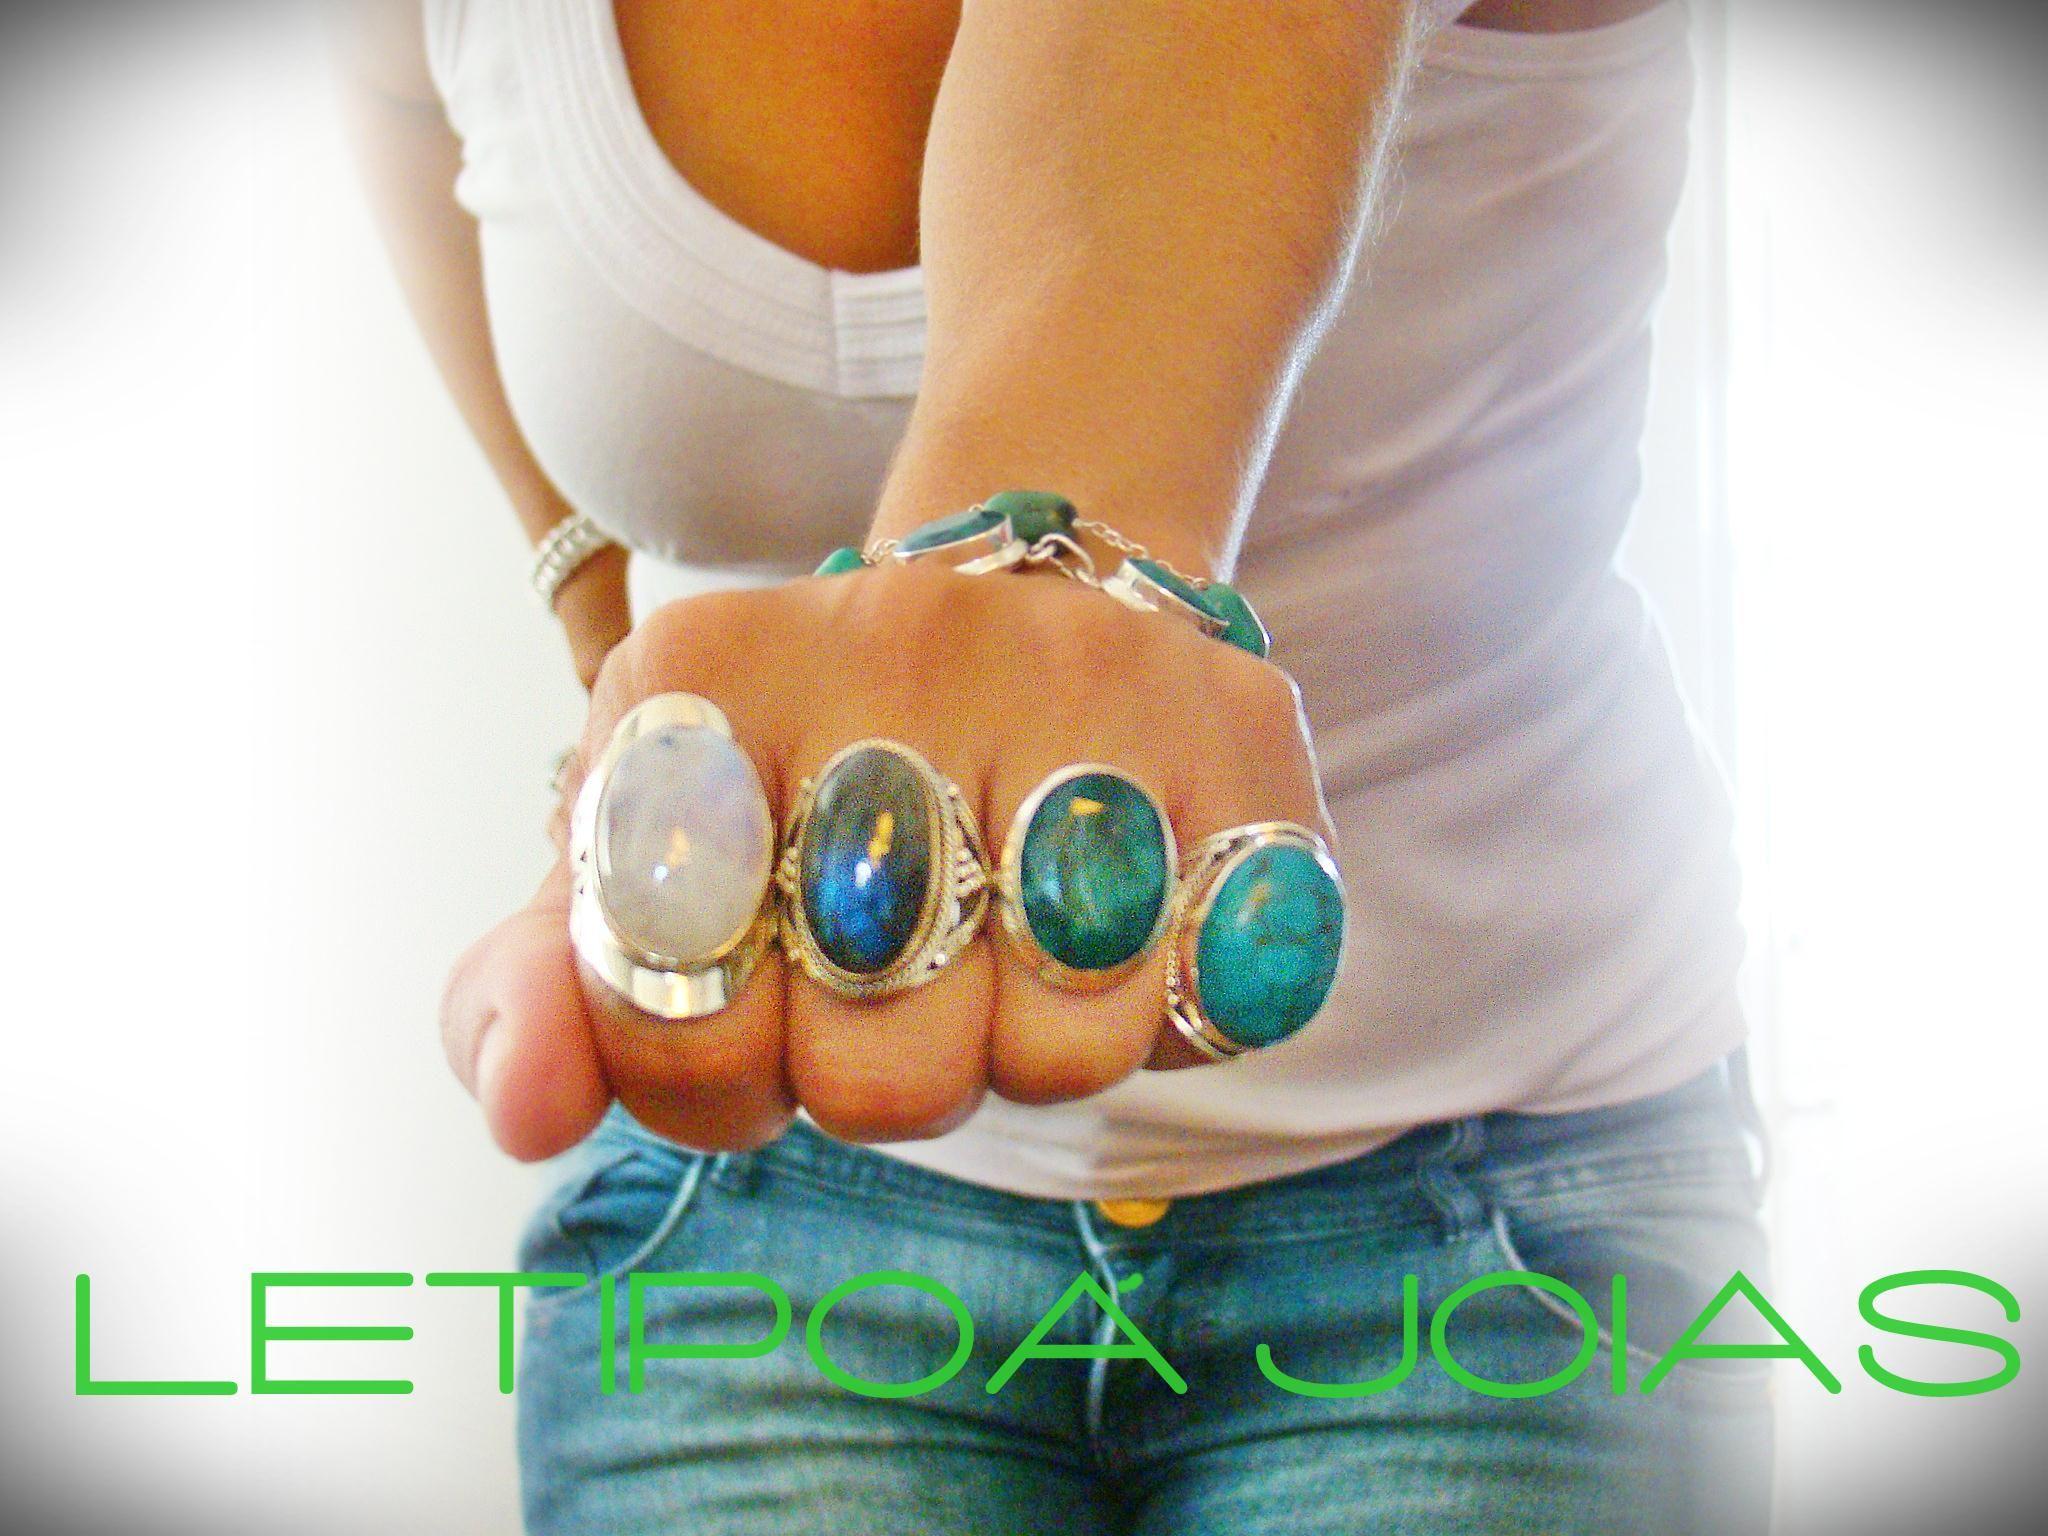 Pedra da Lua, Labradorita, Esmeralda Indiana e Turquesa.  www.facebook.com/letipoajoias